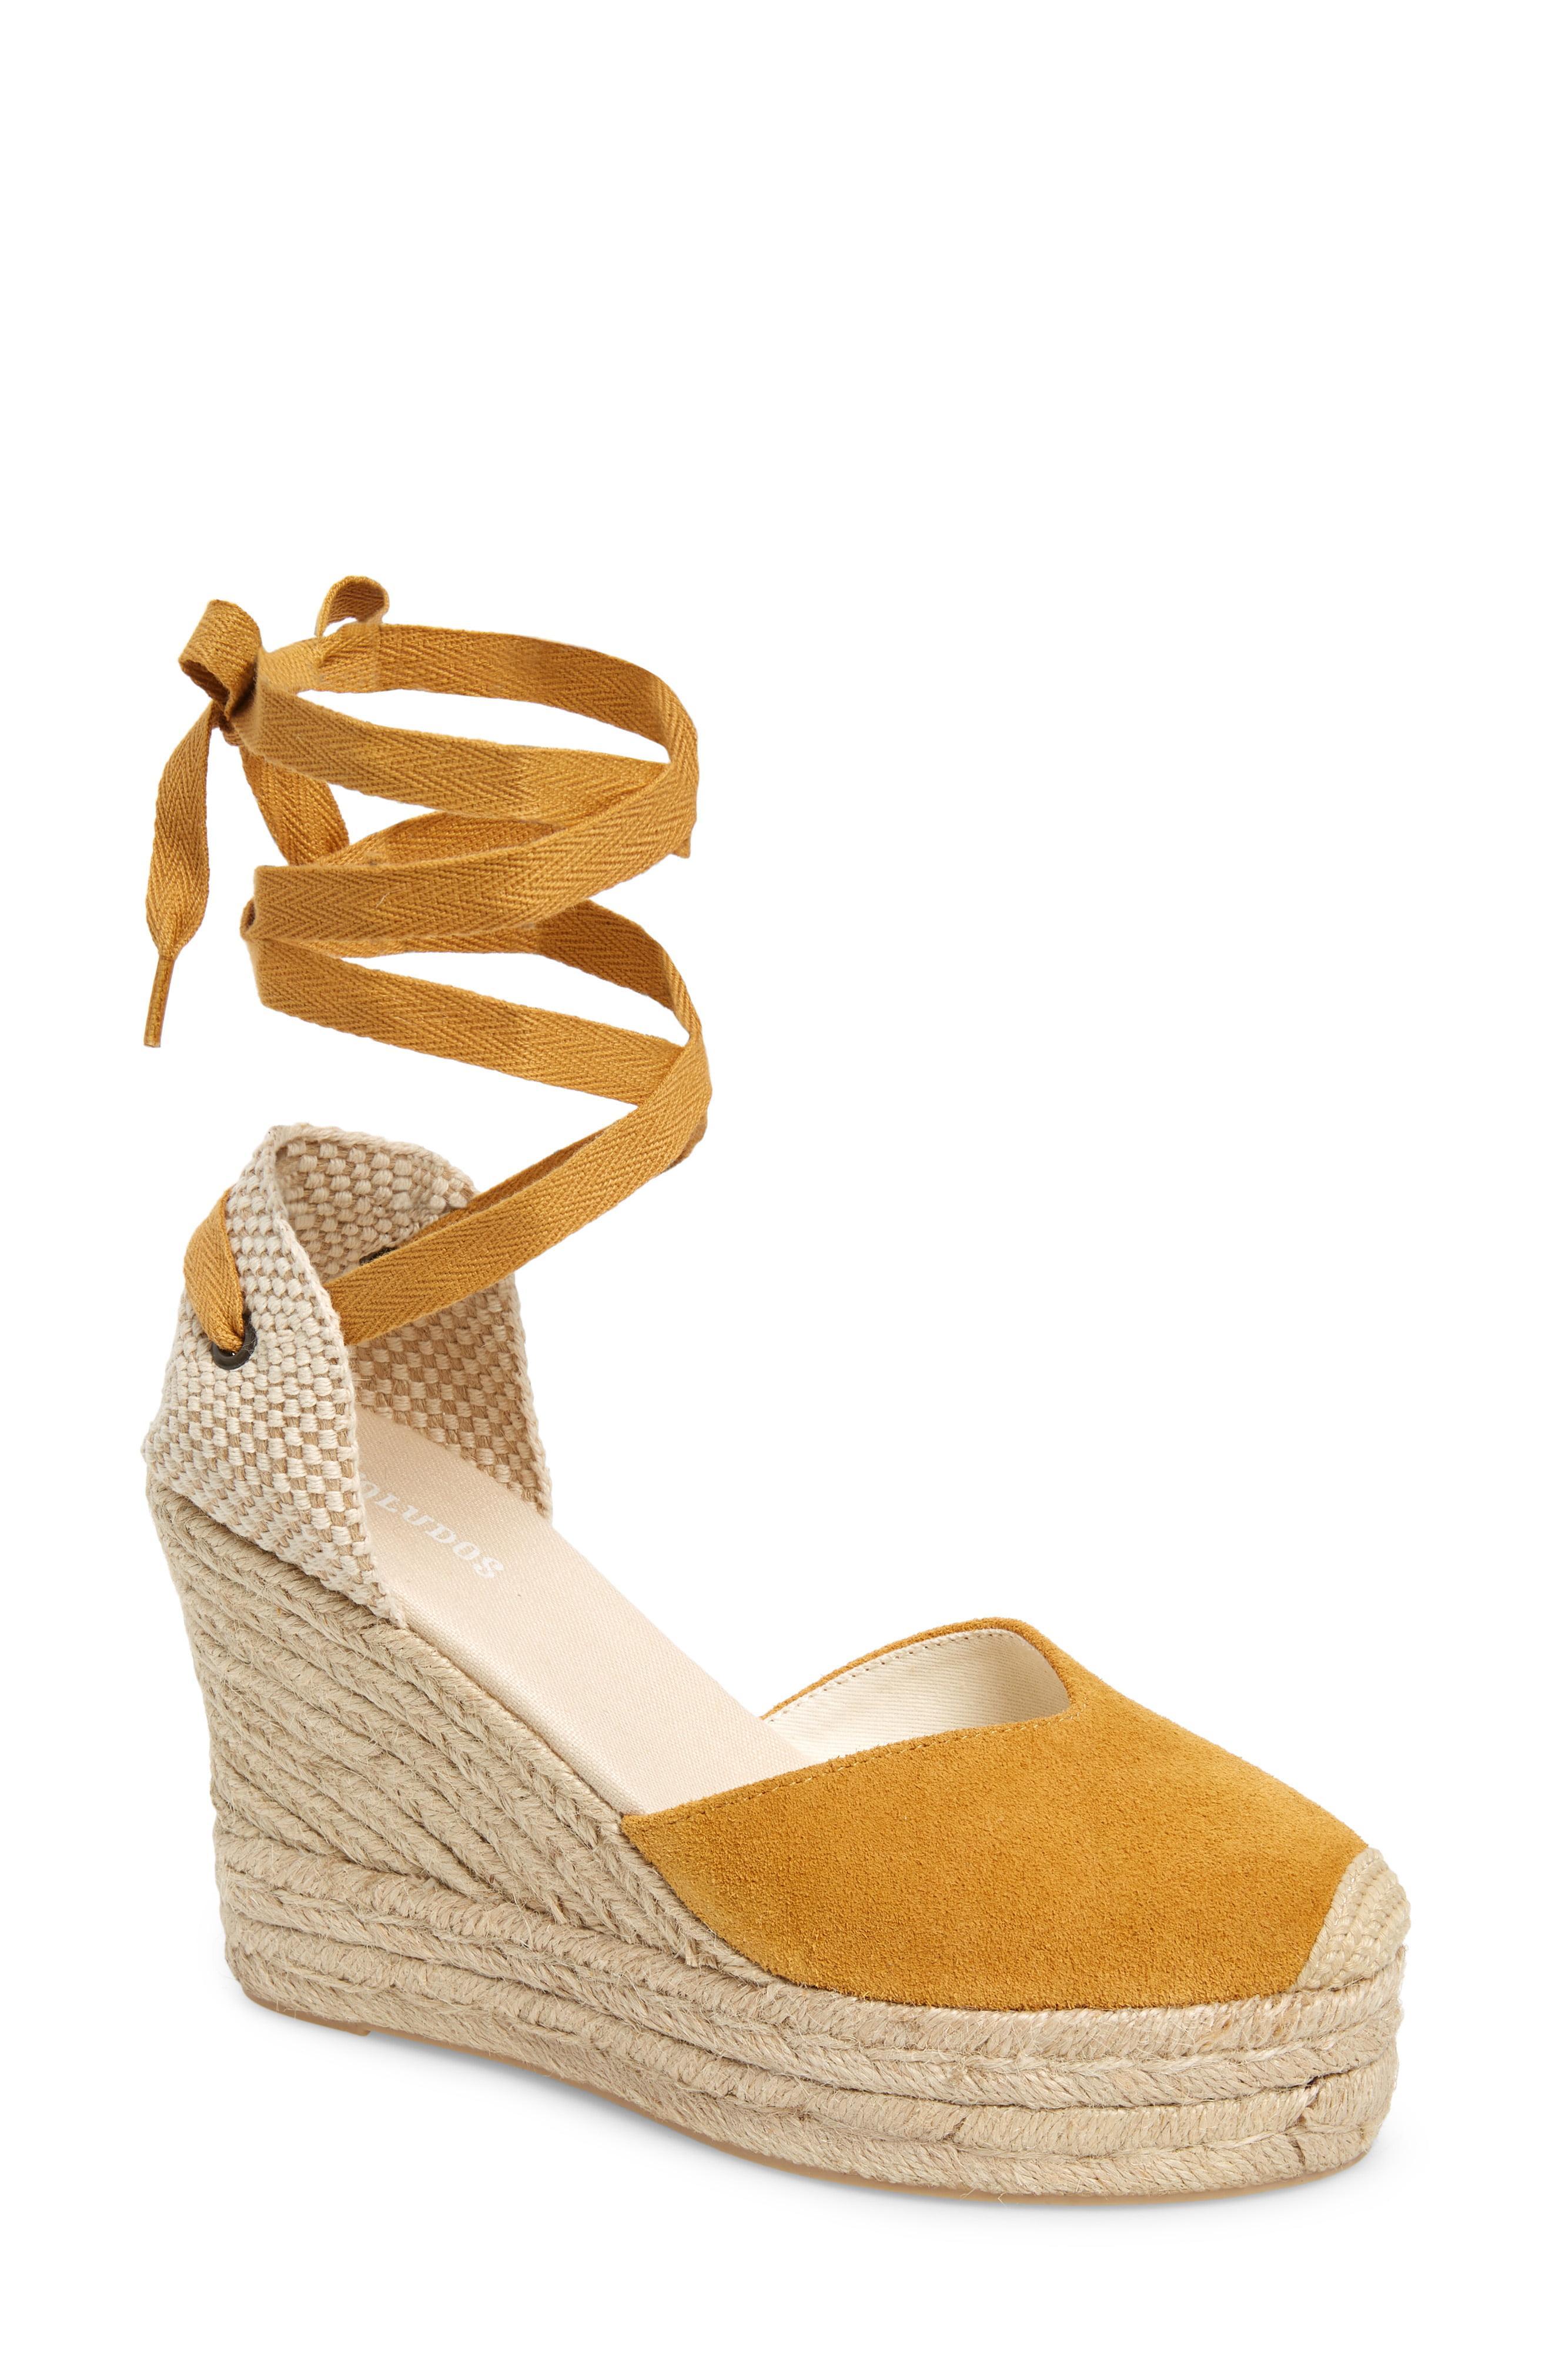 a3ba1e2a7ed Lyst - Soludos Mallorca Lace-up Espadrille Wedge Sandal in Metallic